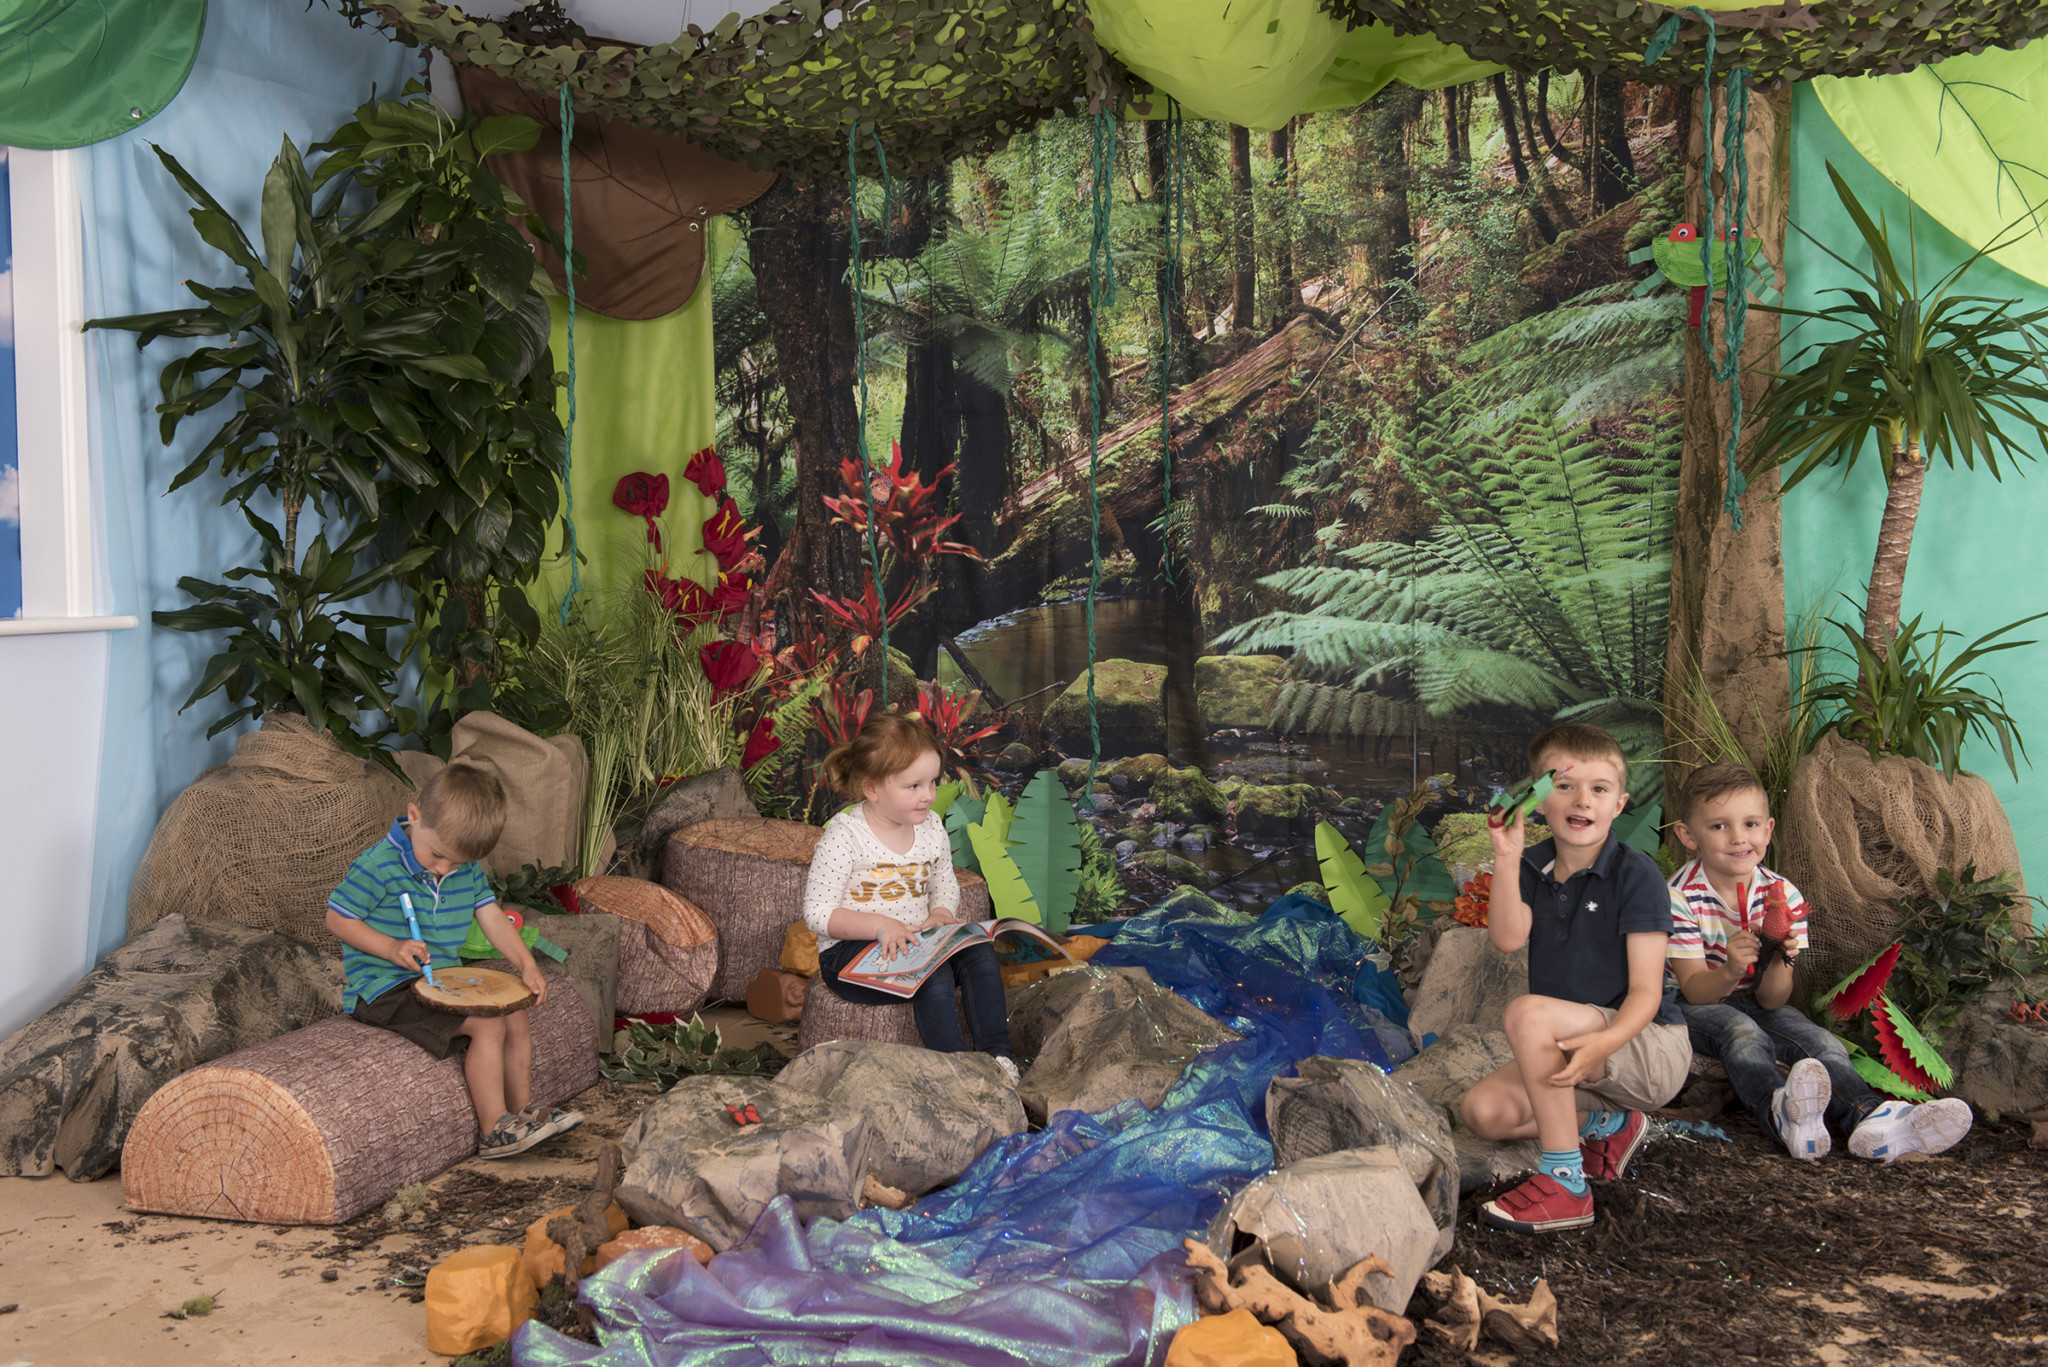 Rainforest backdrop immersive environment